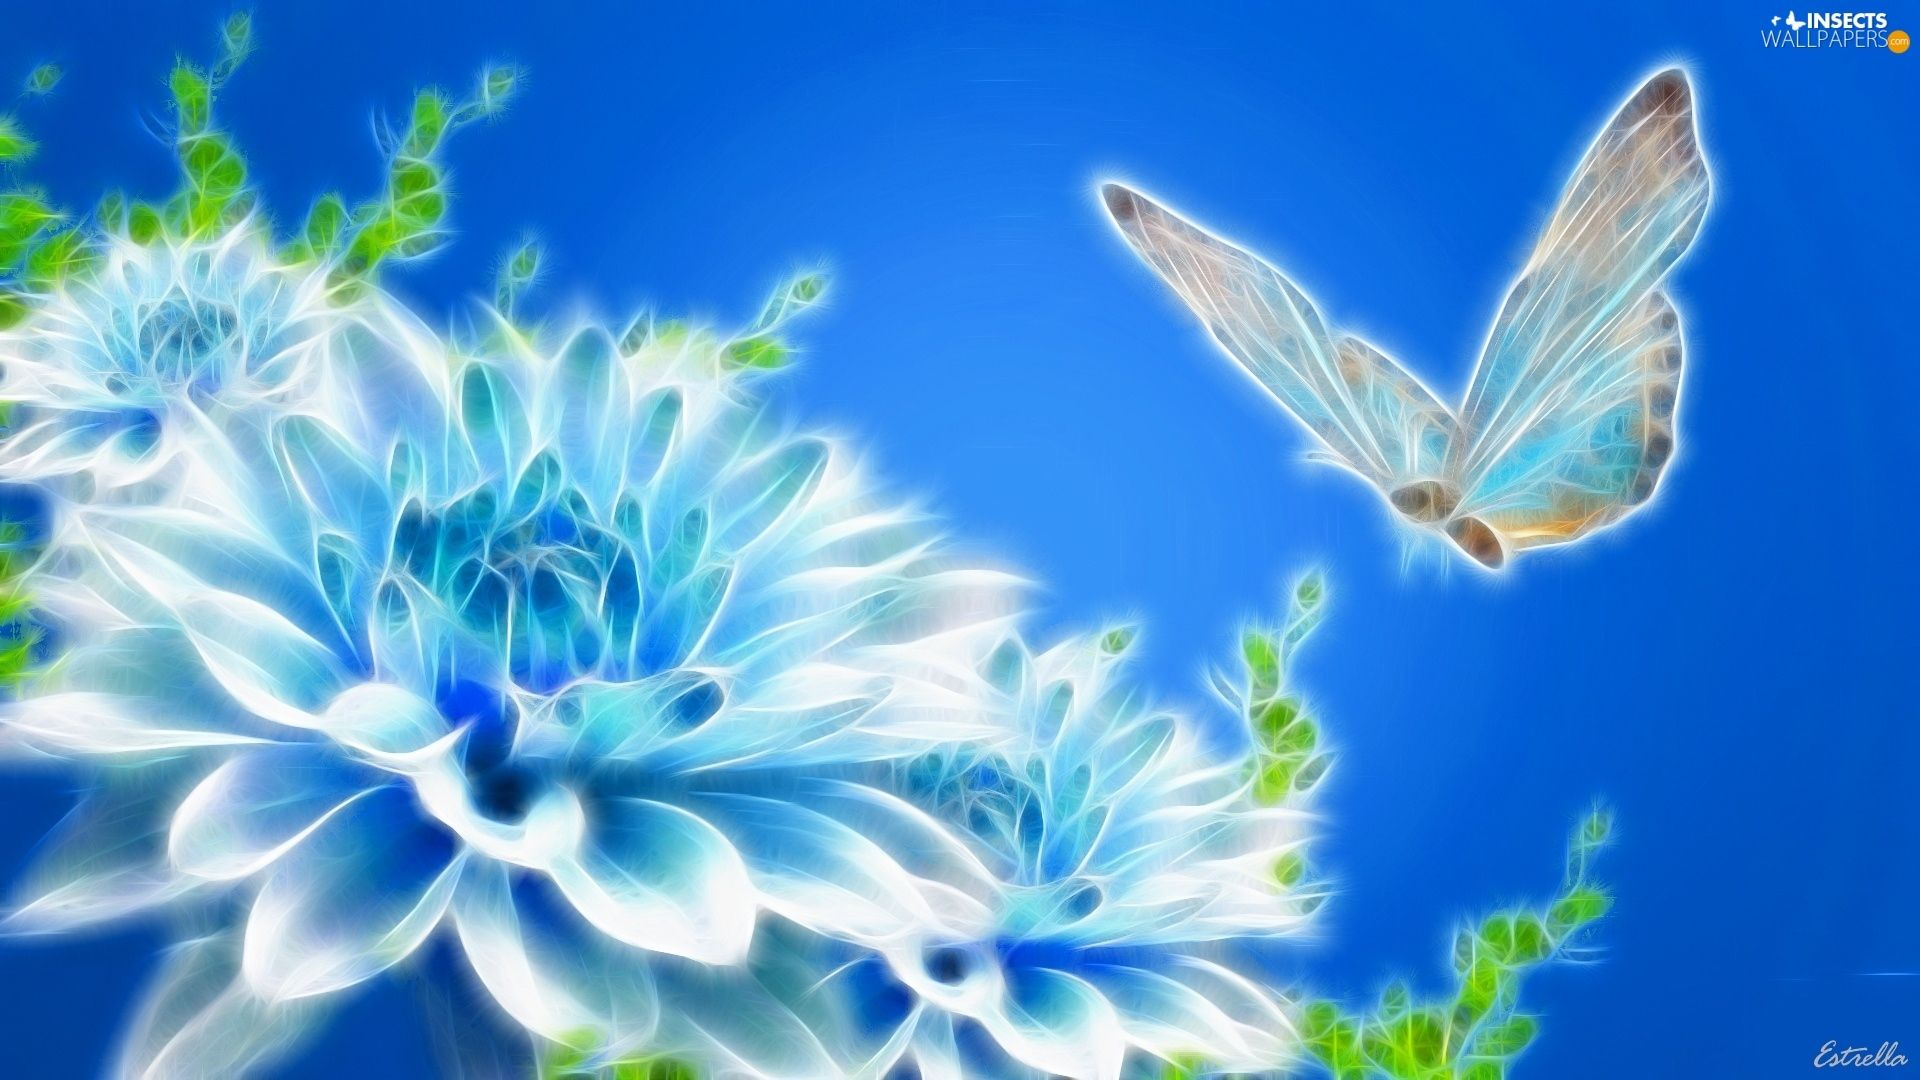 butterfly-3d-flowers-blue-colourfull-background.jpg (1920×1080)